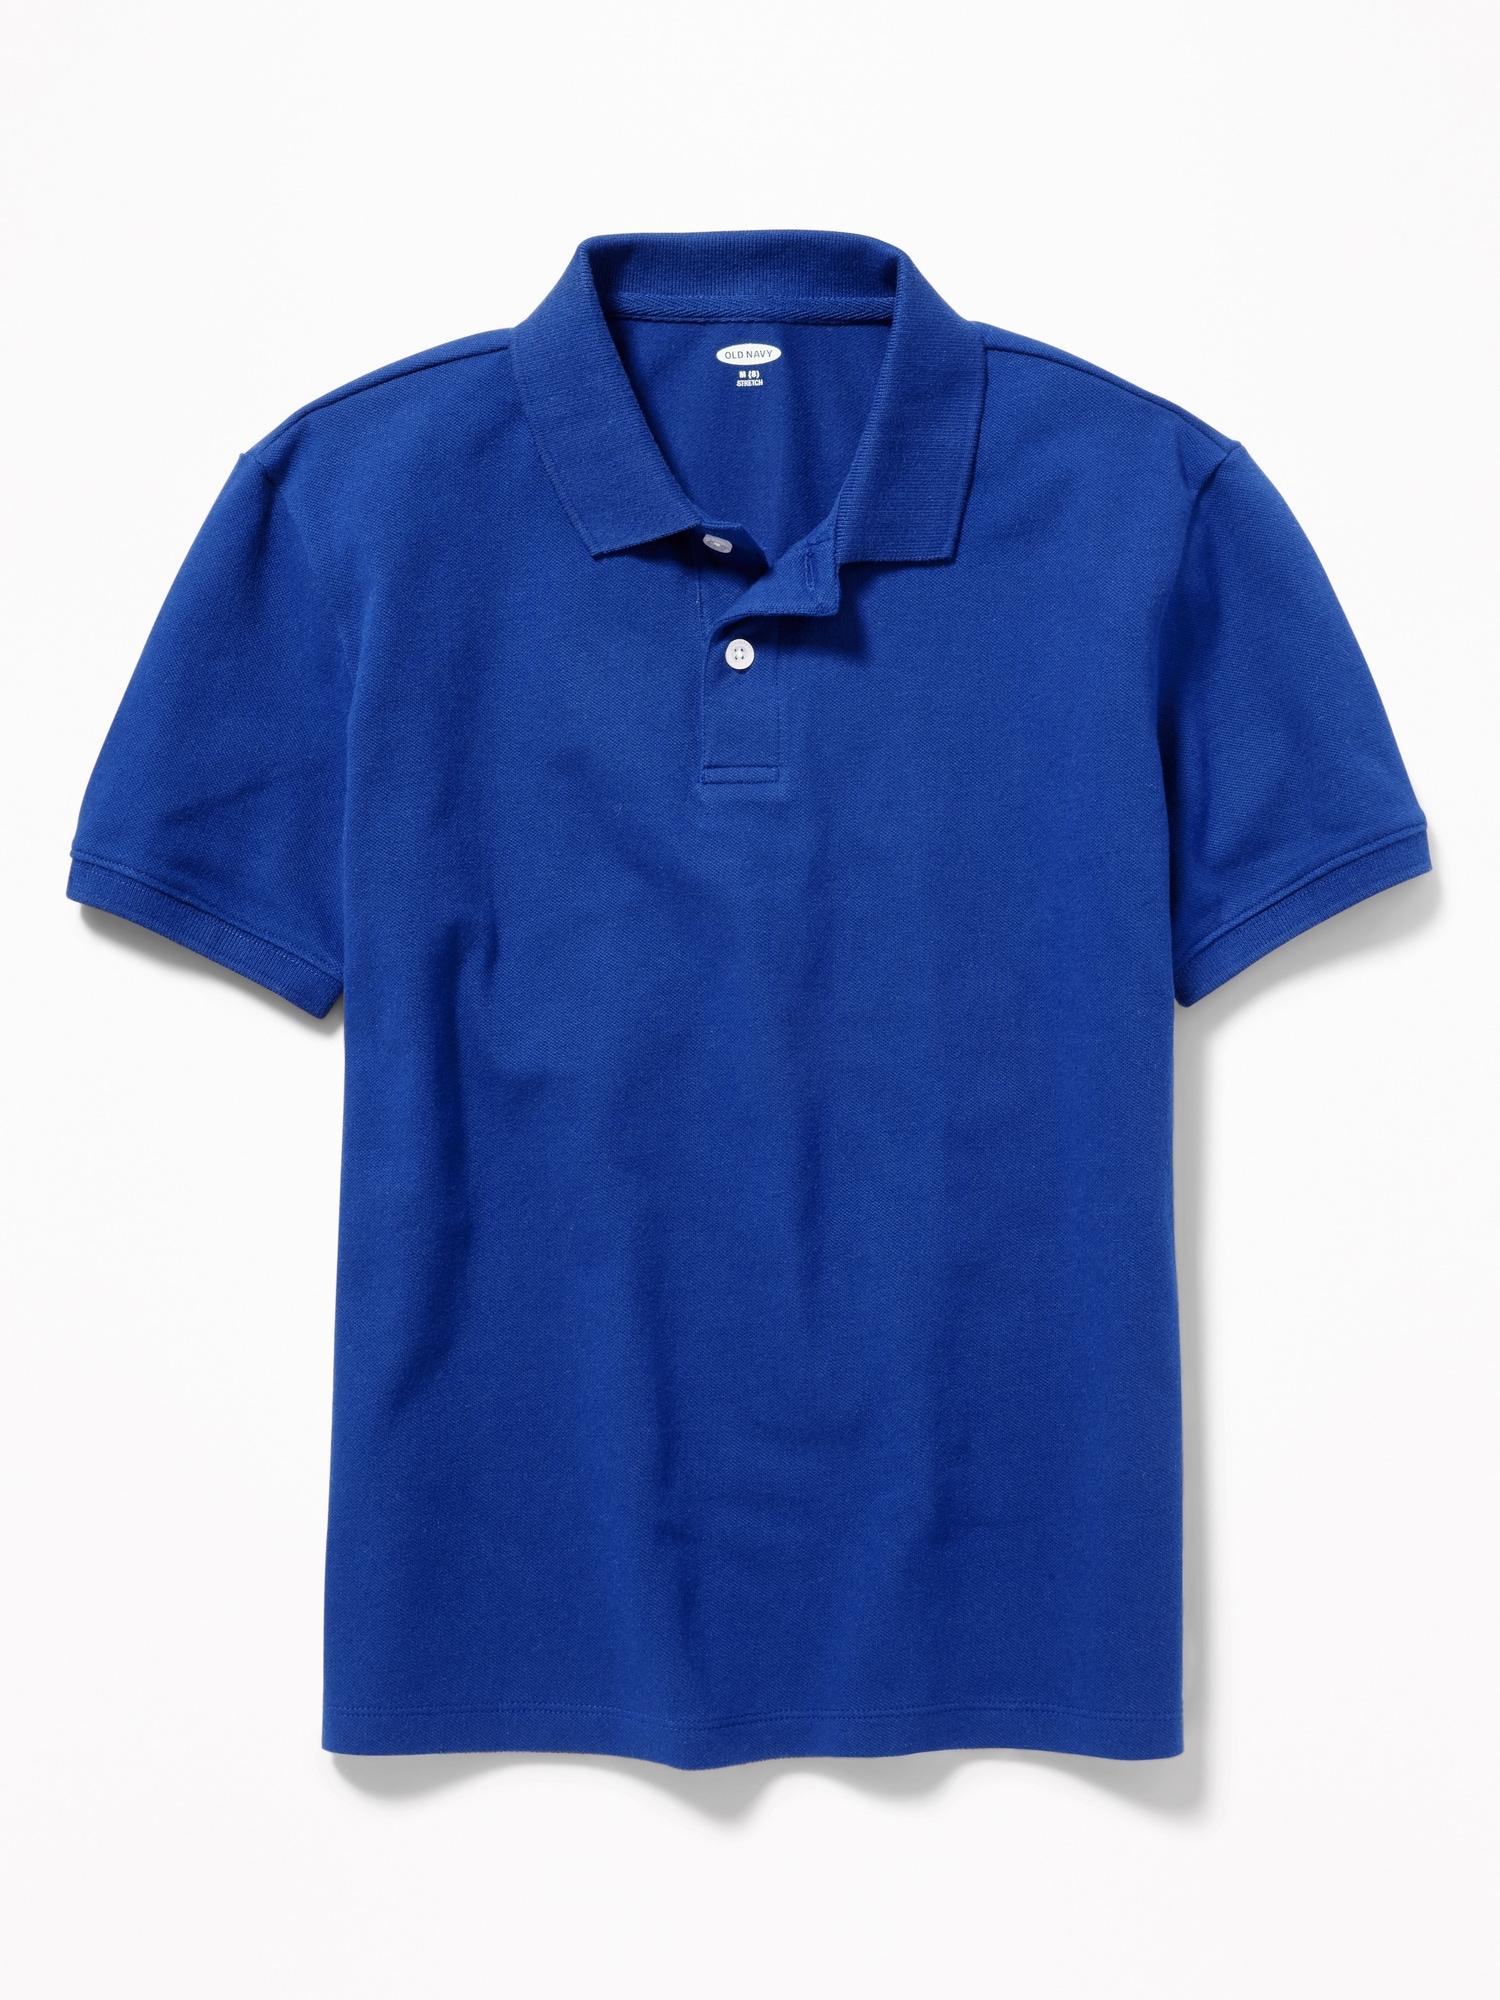 School Uniform Built-in Flex Pique Polo for Boys!